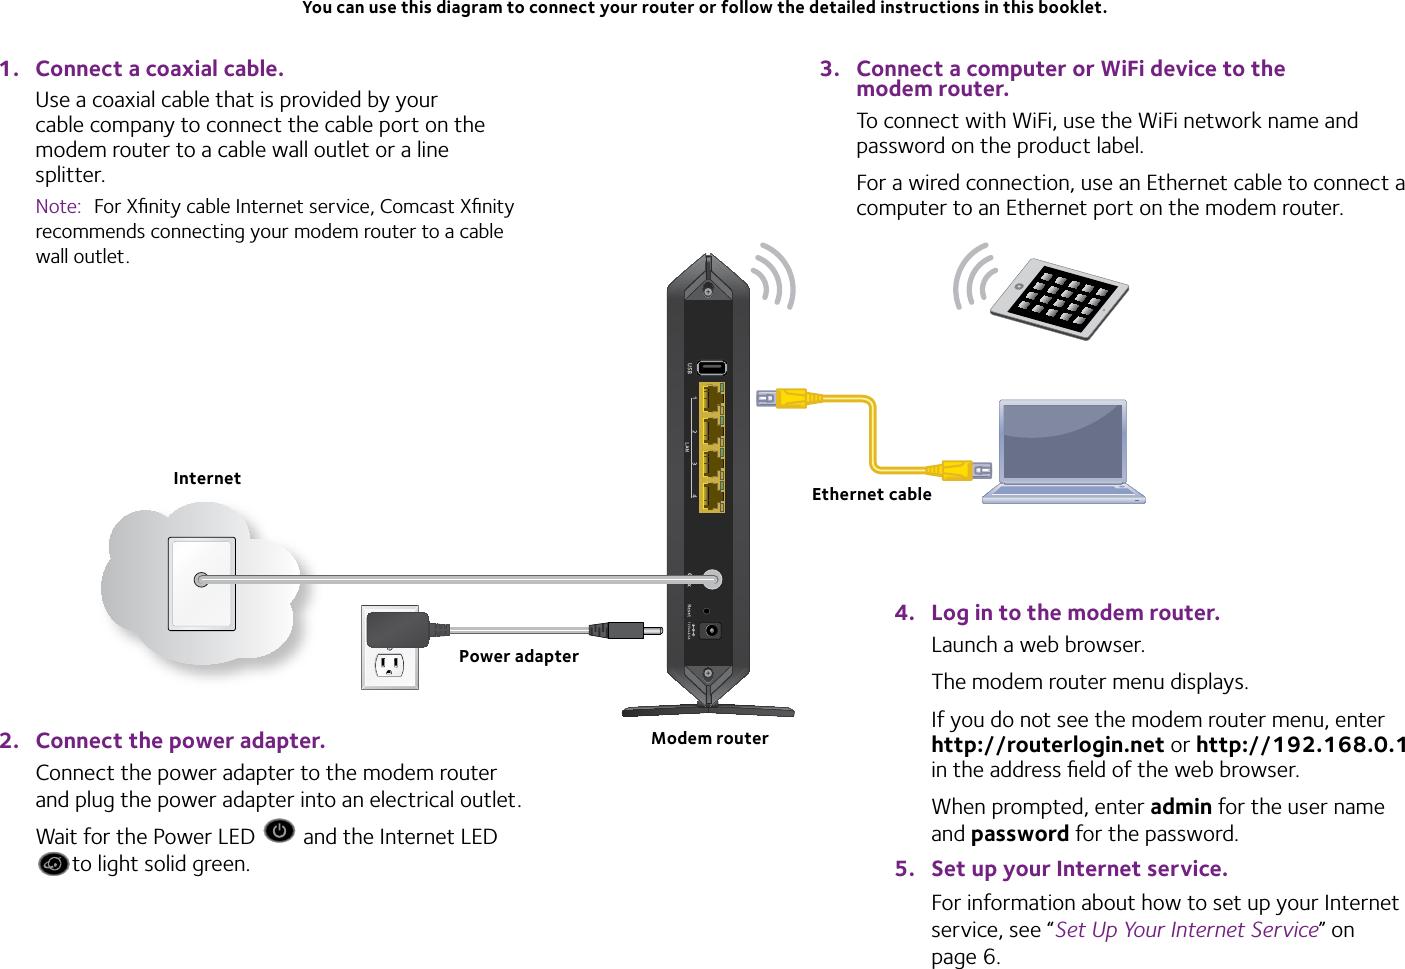 Xfinity Phone Wiring Diagram - 318899 Loupe Monitor Wiring Diagram -  dvi-d.tukune.jeanjaures37.fr | X1 Modem Wiring Diagram |  | Wiring Diagram Resource